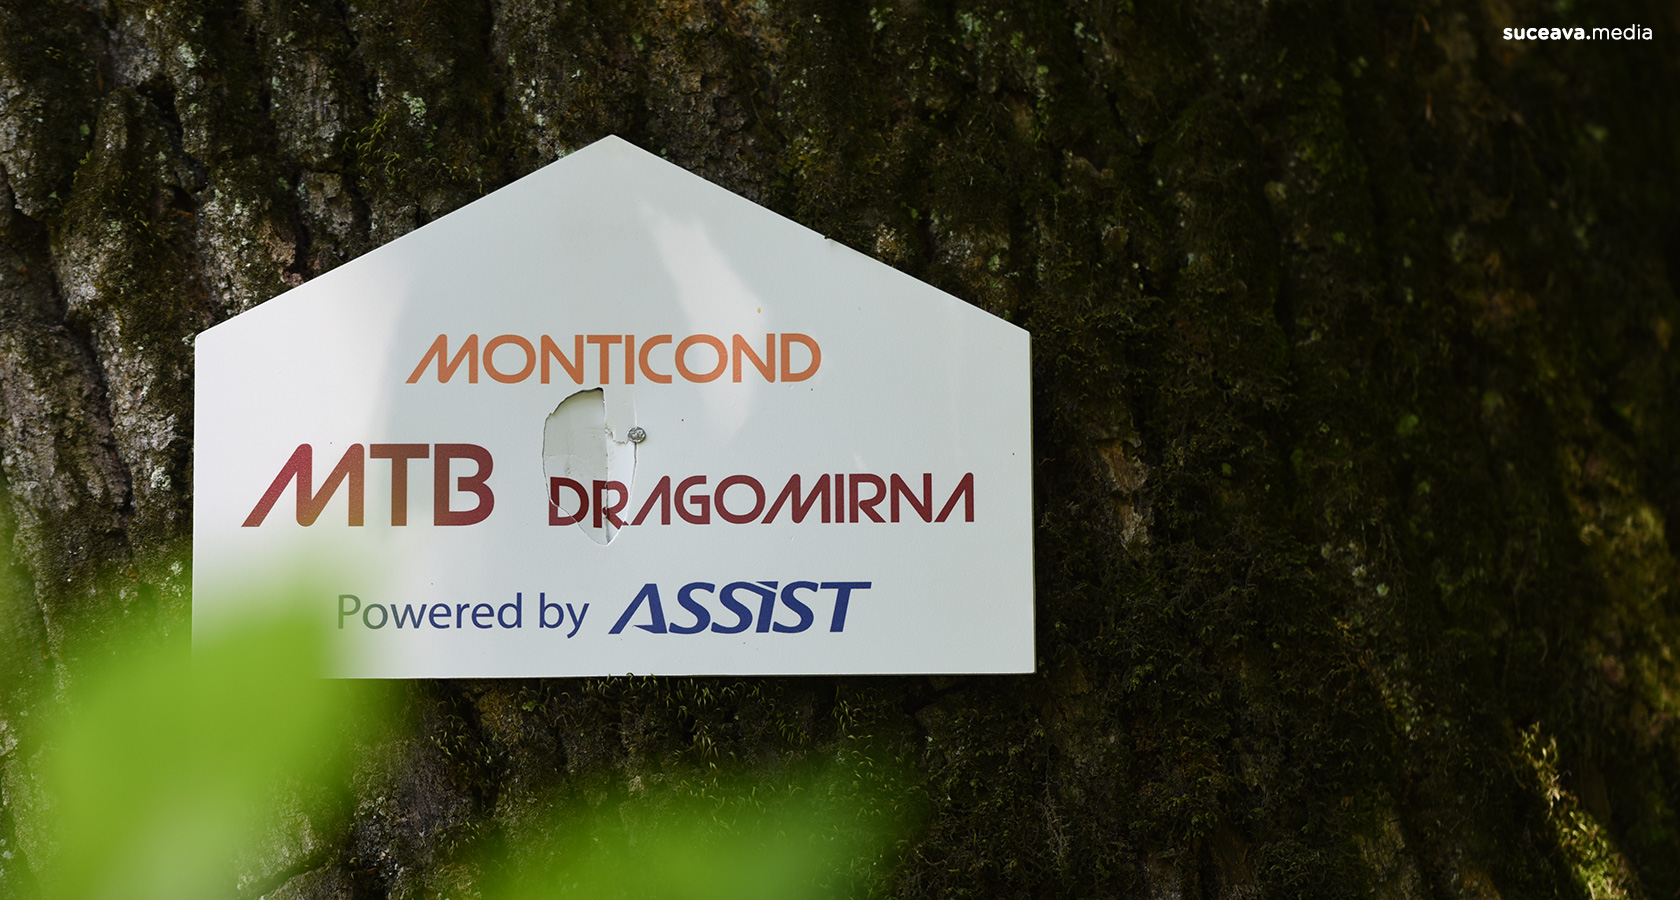 MTB Dragomirna powered by ASSIST